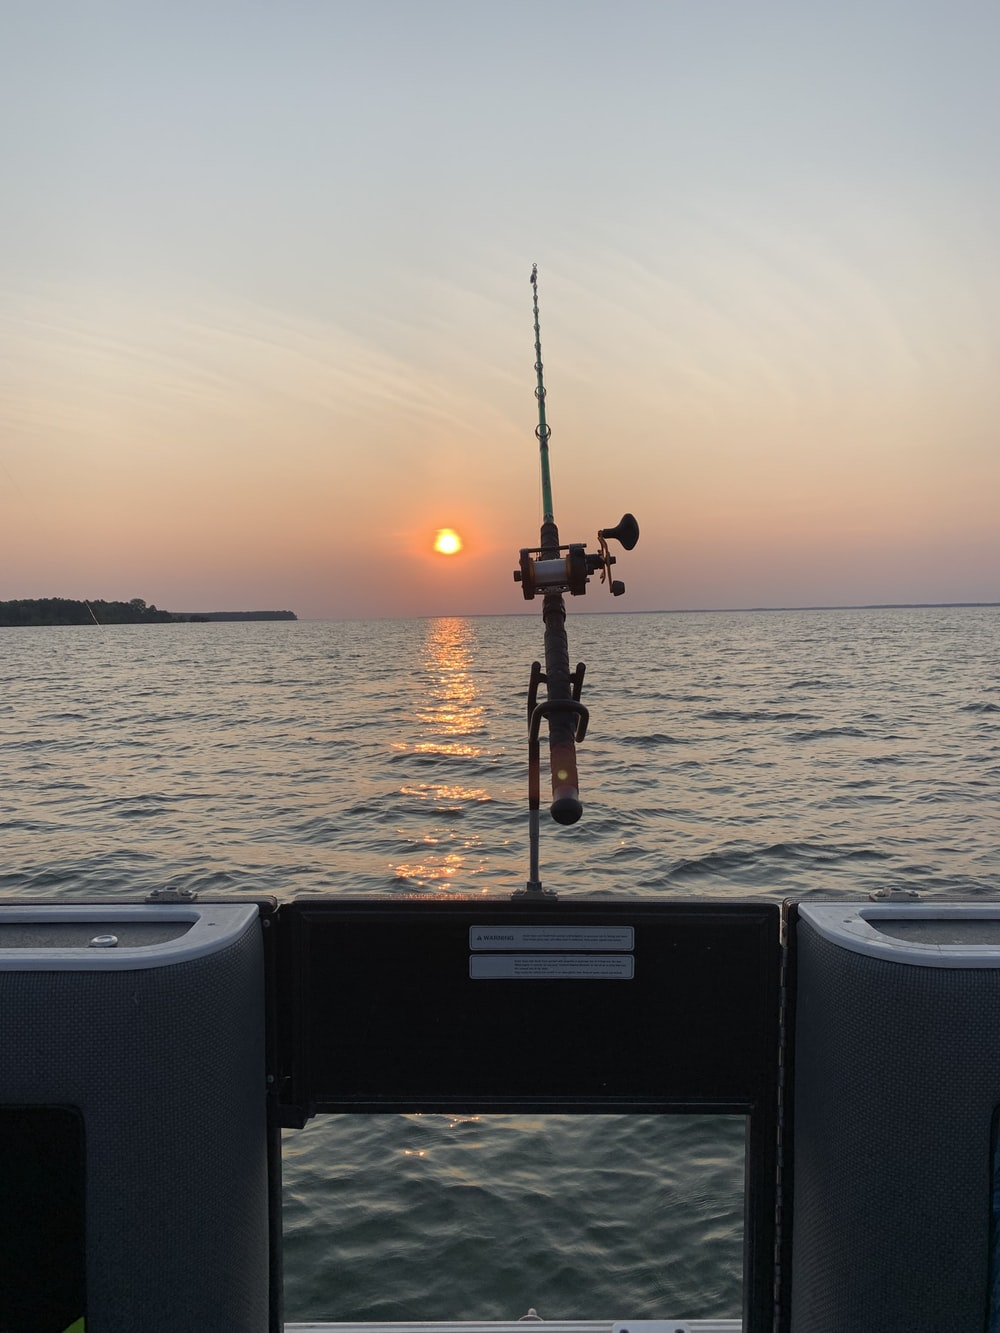 black fishing rod on white boat during sunset